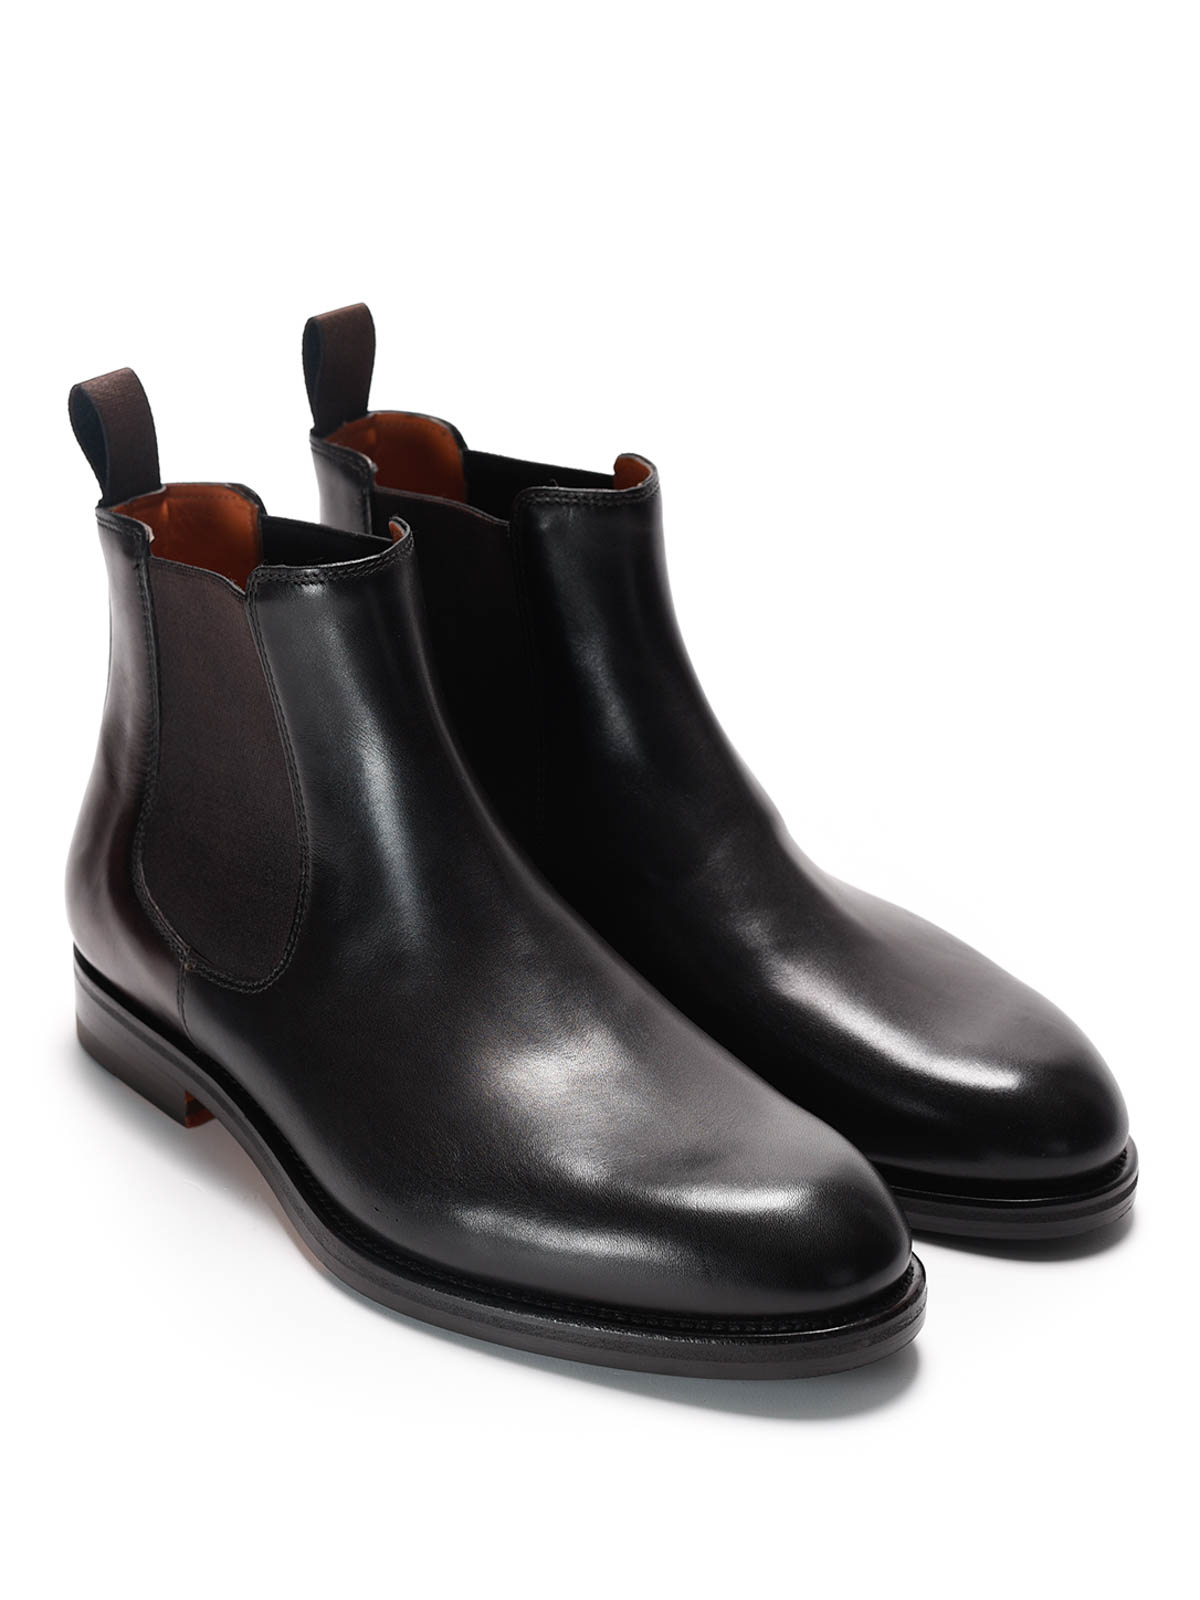 Santoni studded boots shop sale online find great sale online under $60 outlet excellent outlet locations 9pDbP